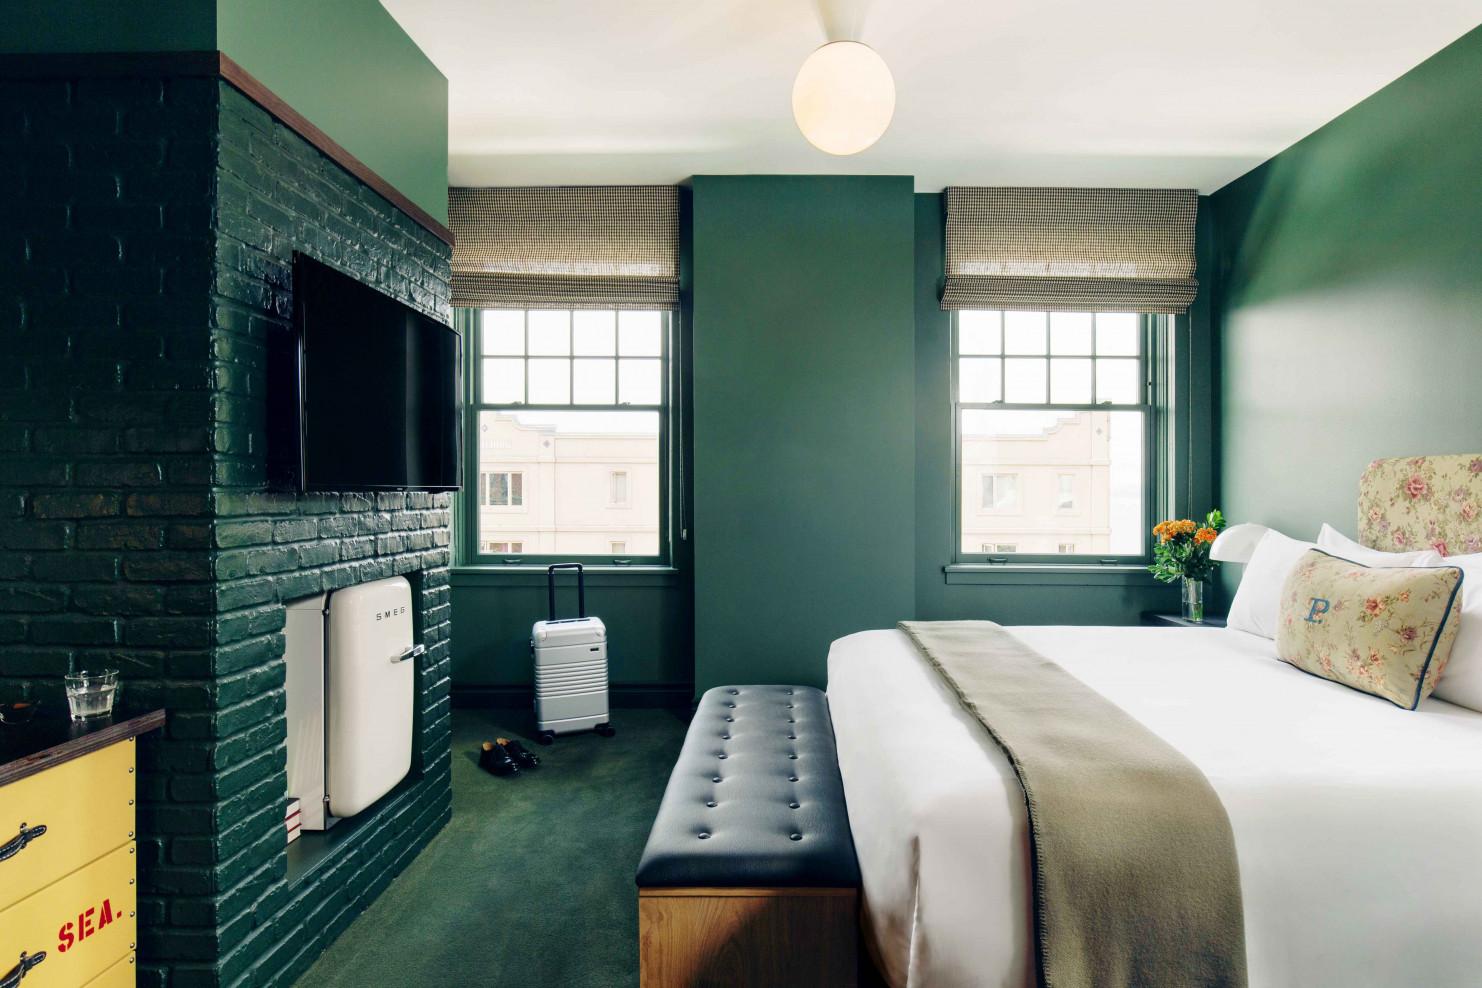 Pleasing Boutique Hotels In Seattle Best Luxury Hotels Mr Mrs Smith Download Free Architecture Designs Rallybritishbridgeorg